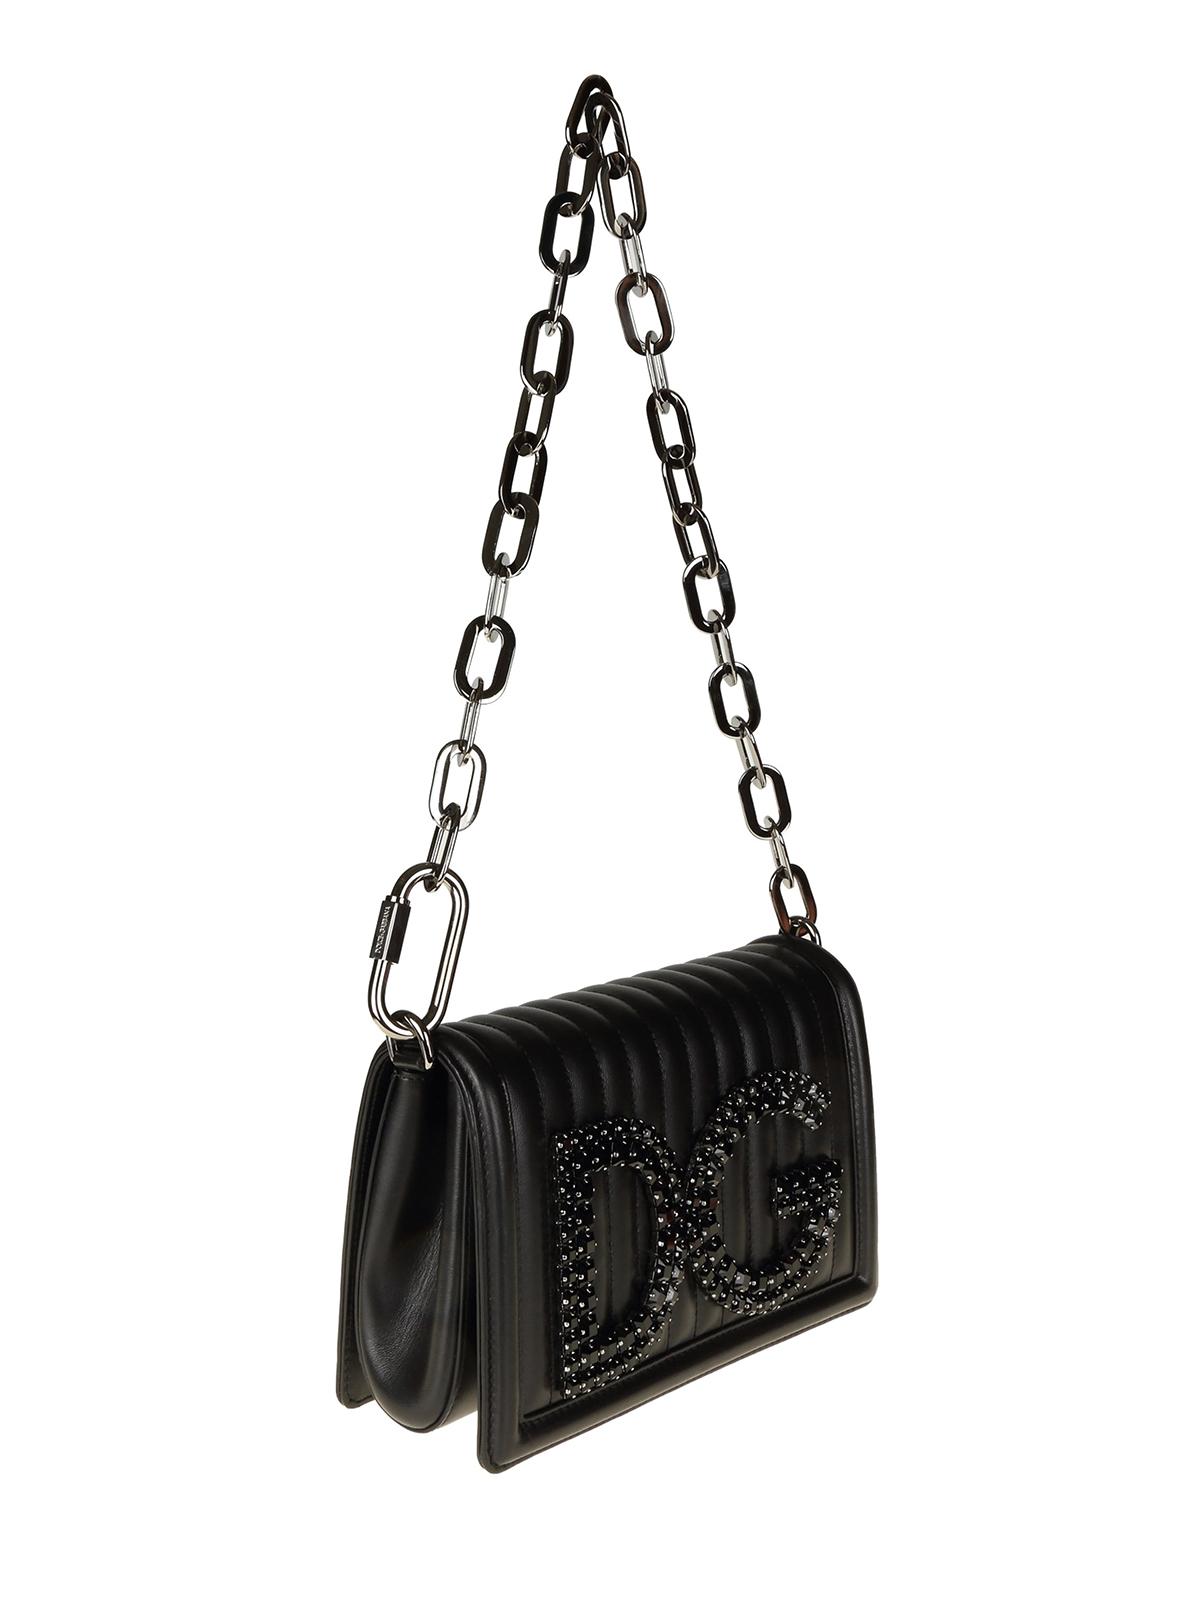 60314963f0d1 DOLCE & GABBANA: shoulder bags online - DG Girls smoky crystal quilted  leather bag